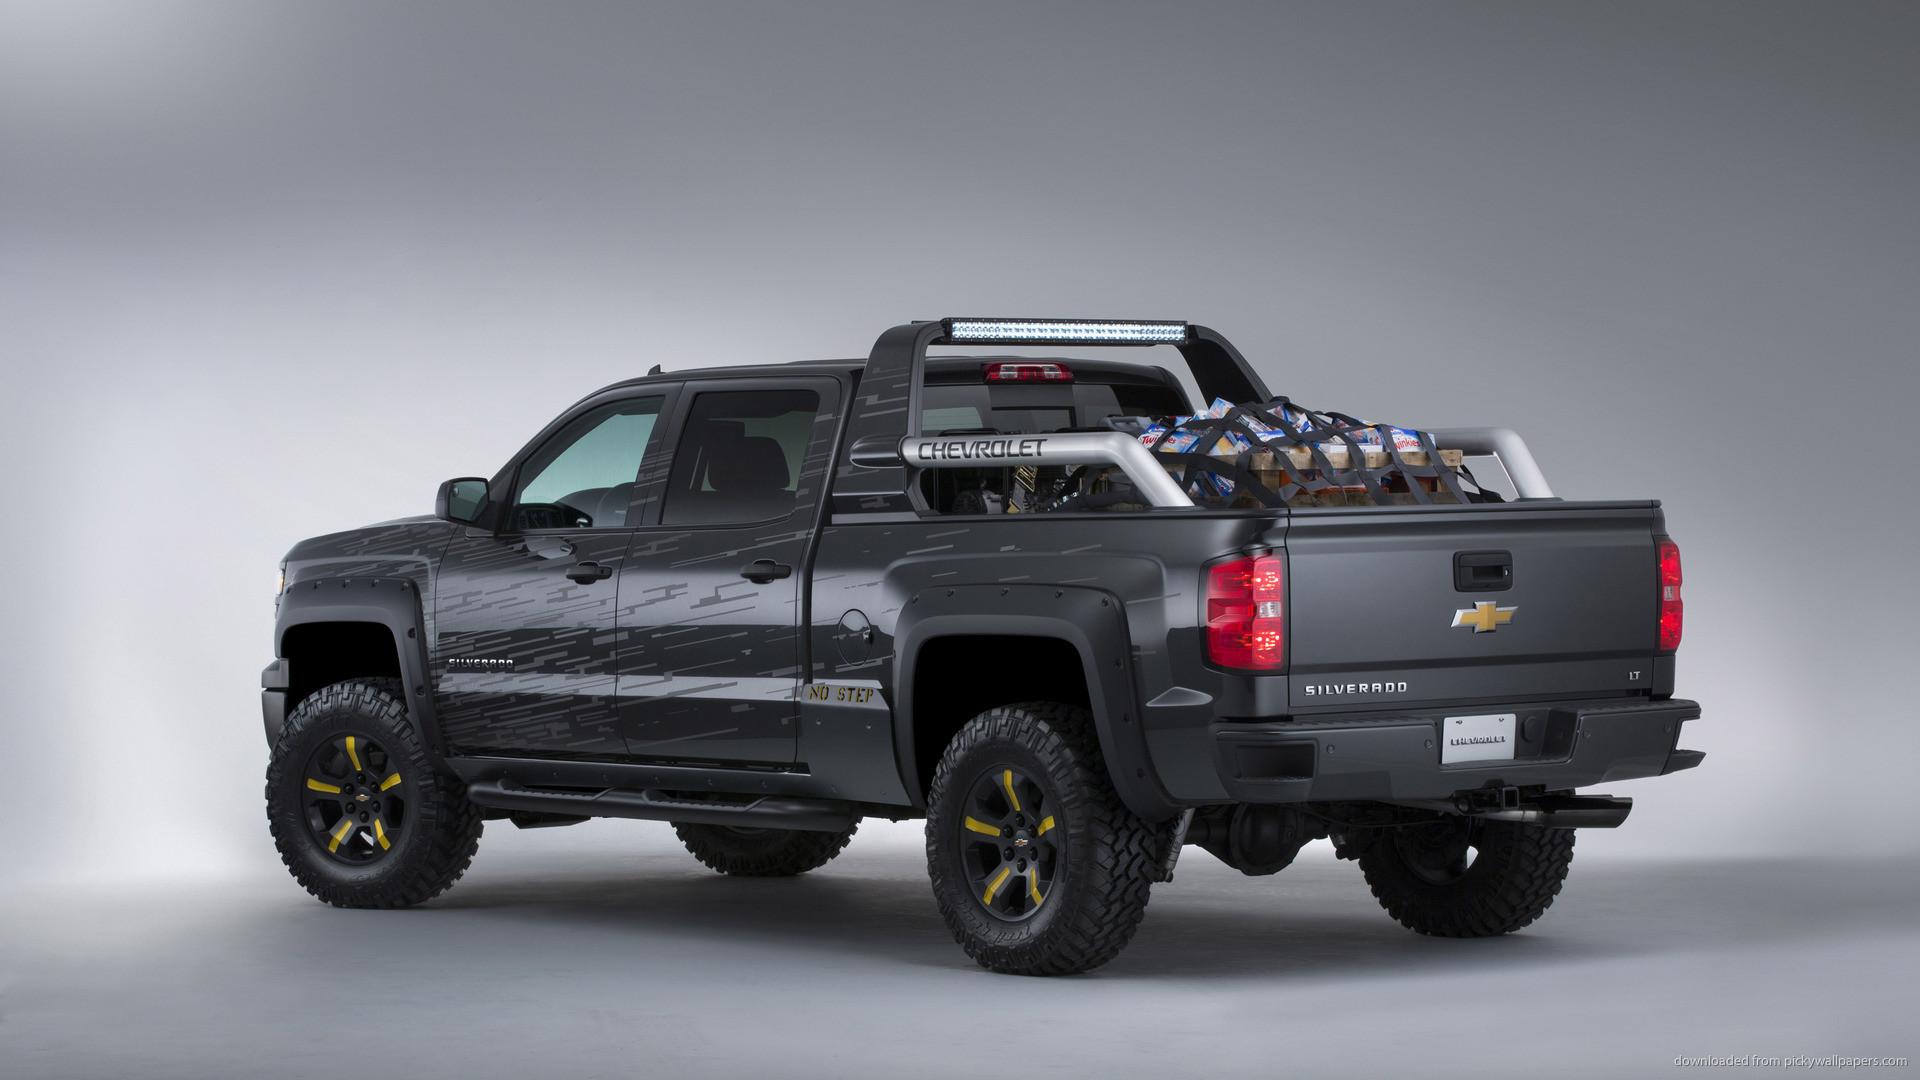 Chevrolet Silverado Black Ops Concept Back picture